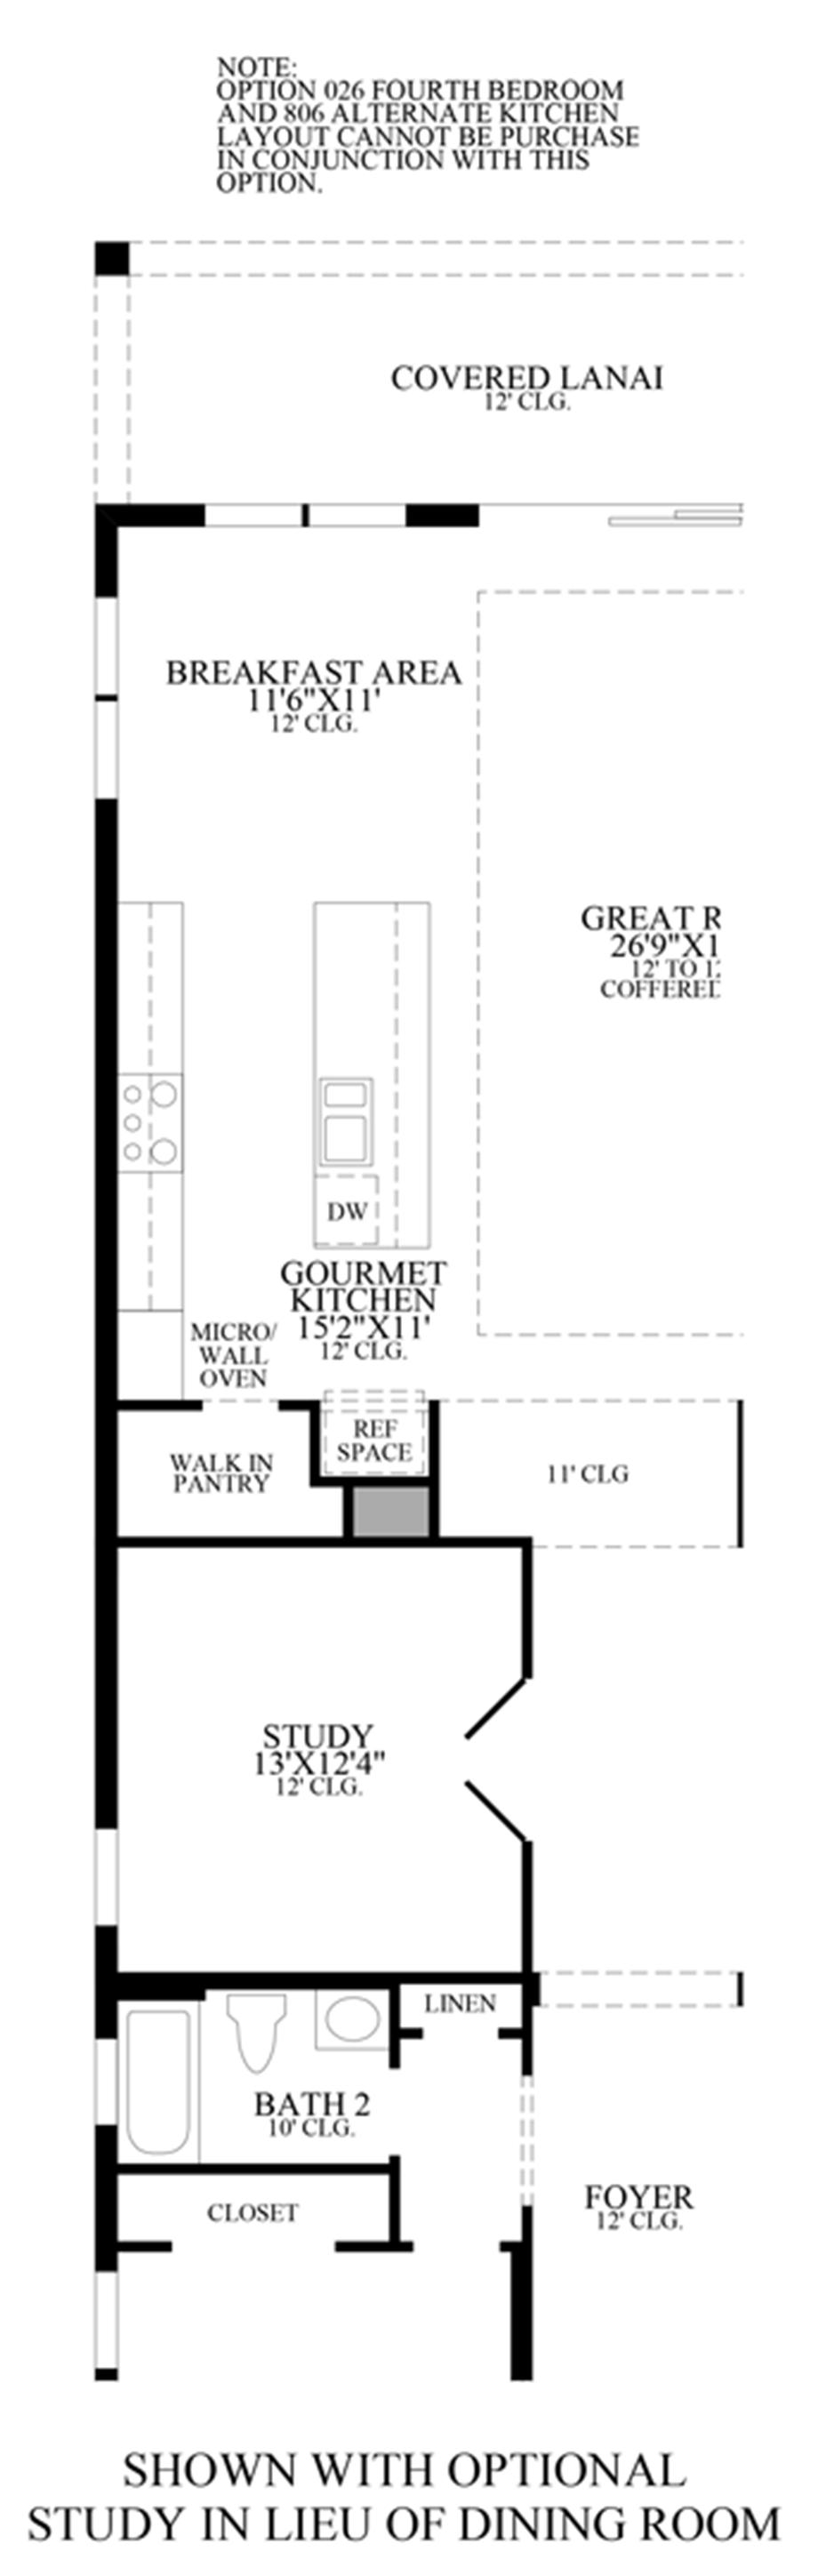 Optional Study ILO Dining Room Floor Plan